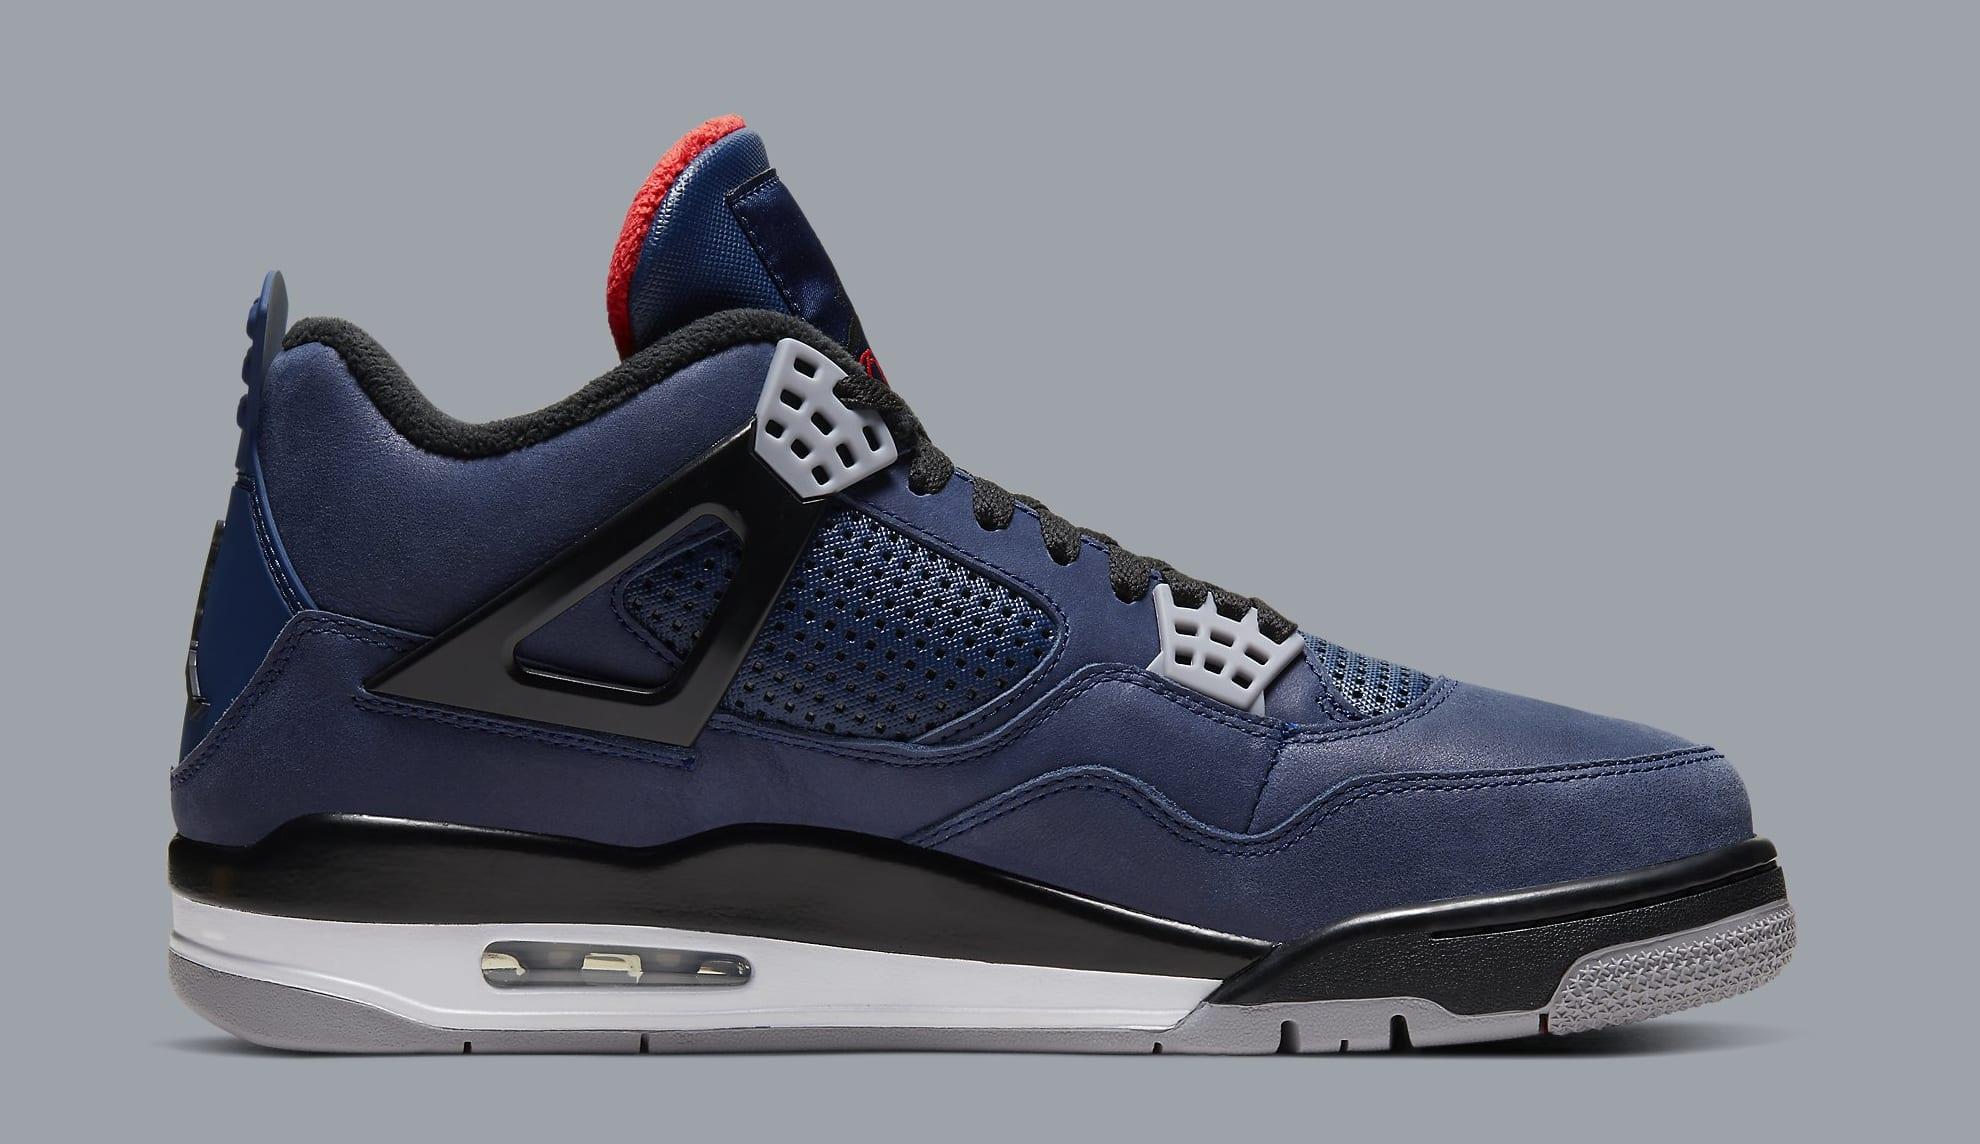 air-jordan-4-iv-retro-wntr-loyal-blue-cq9597-401-medial